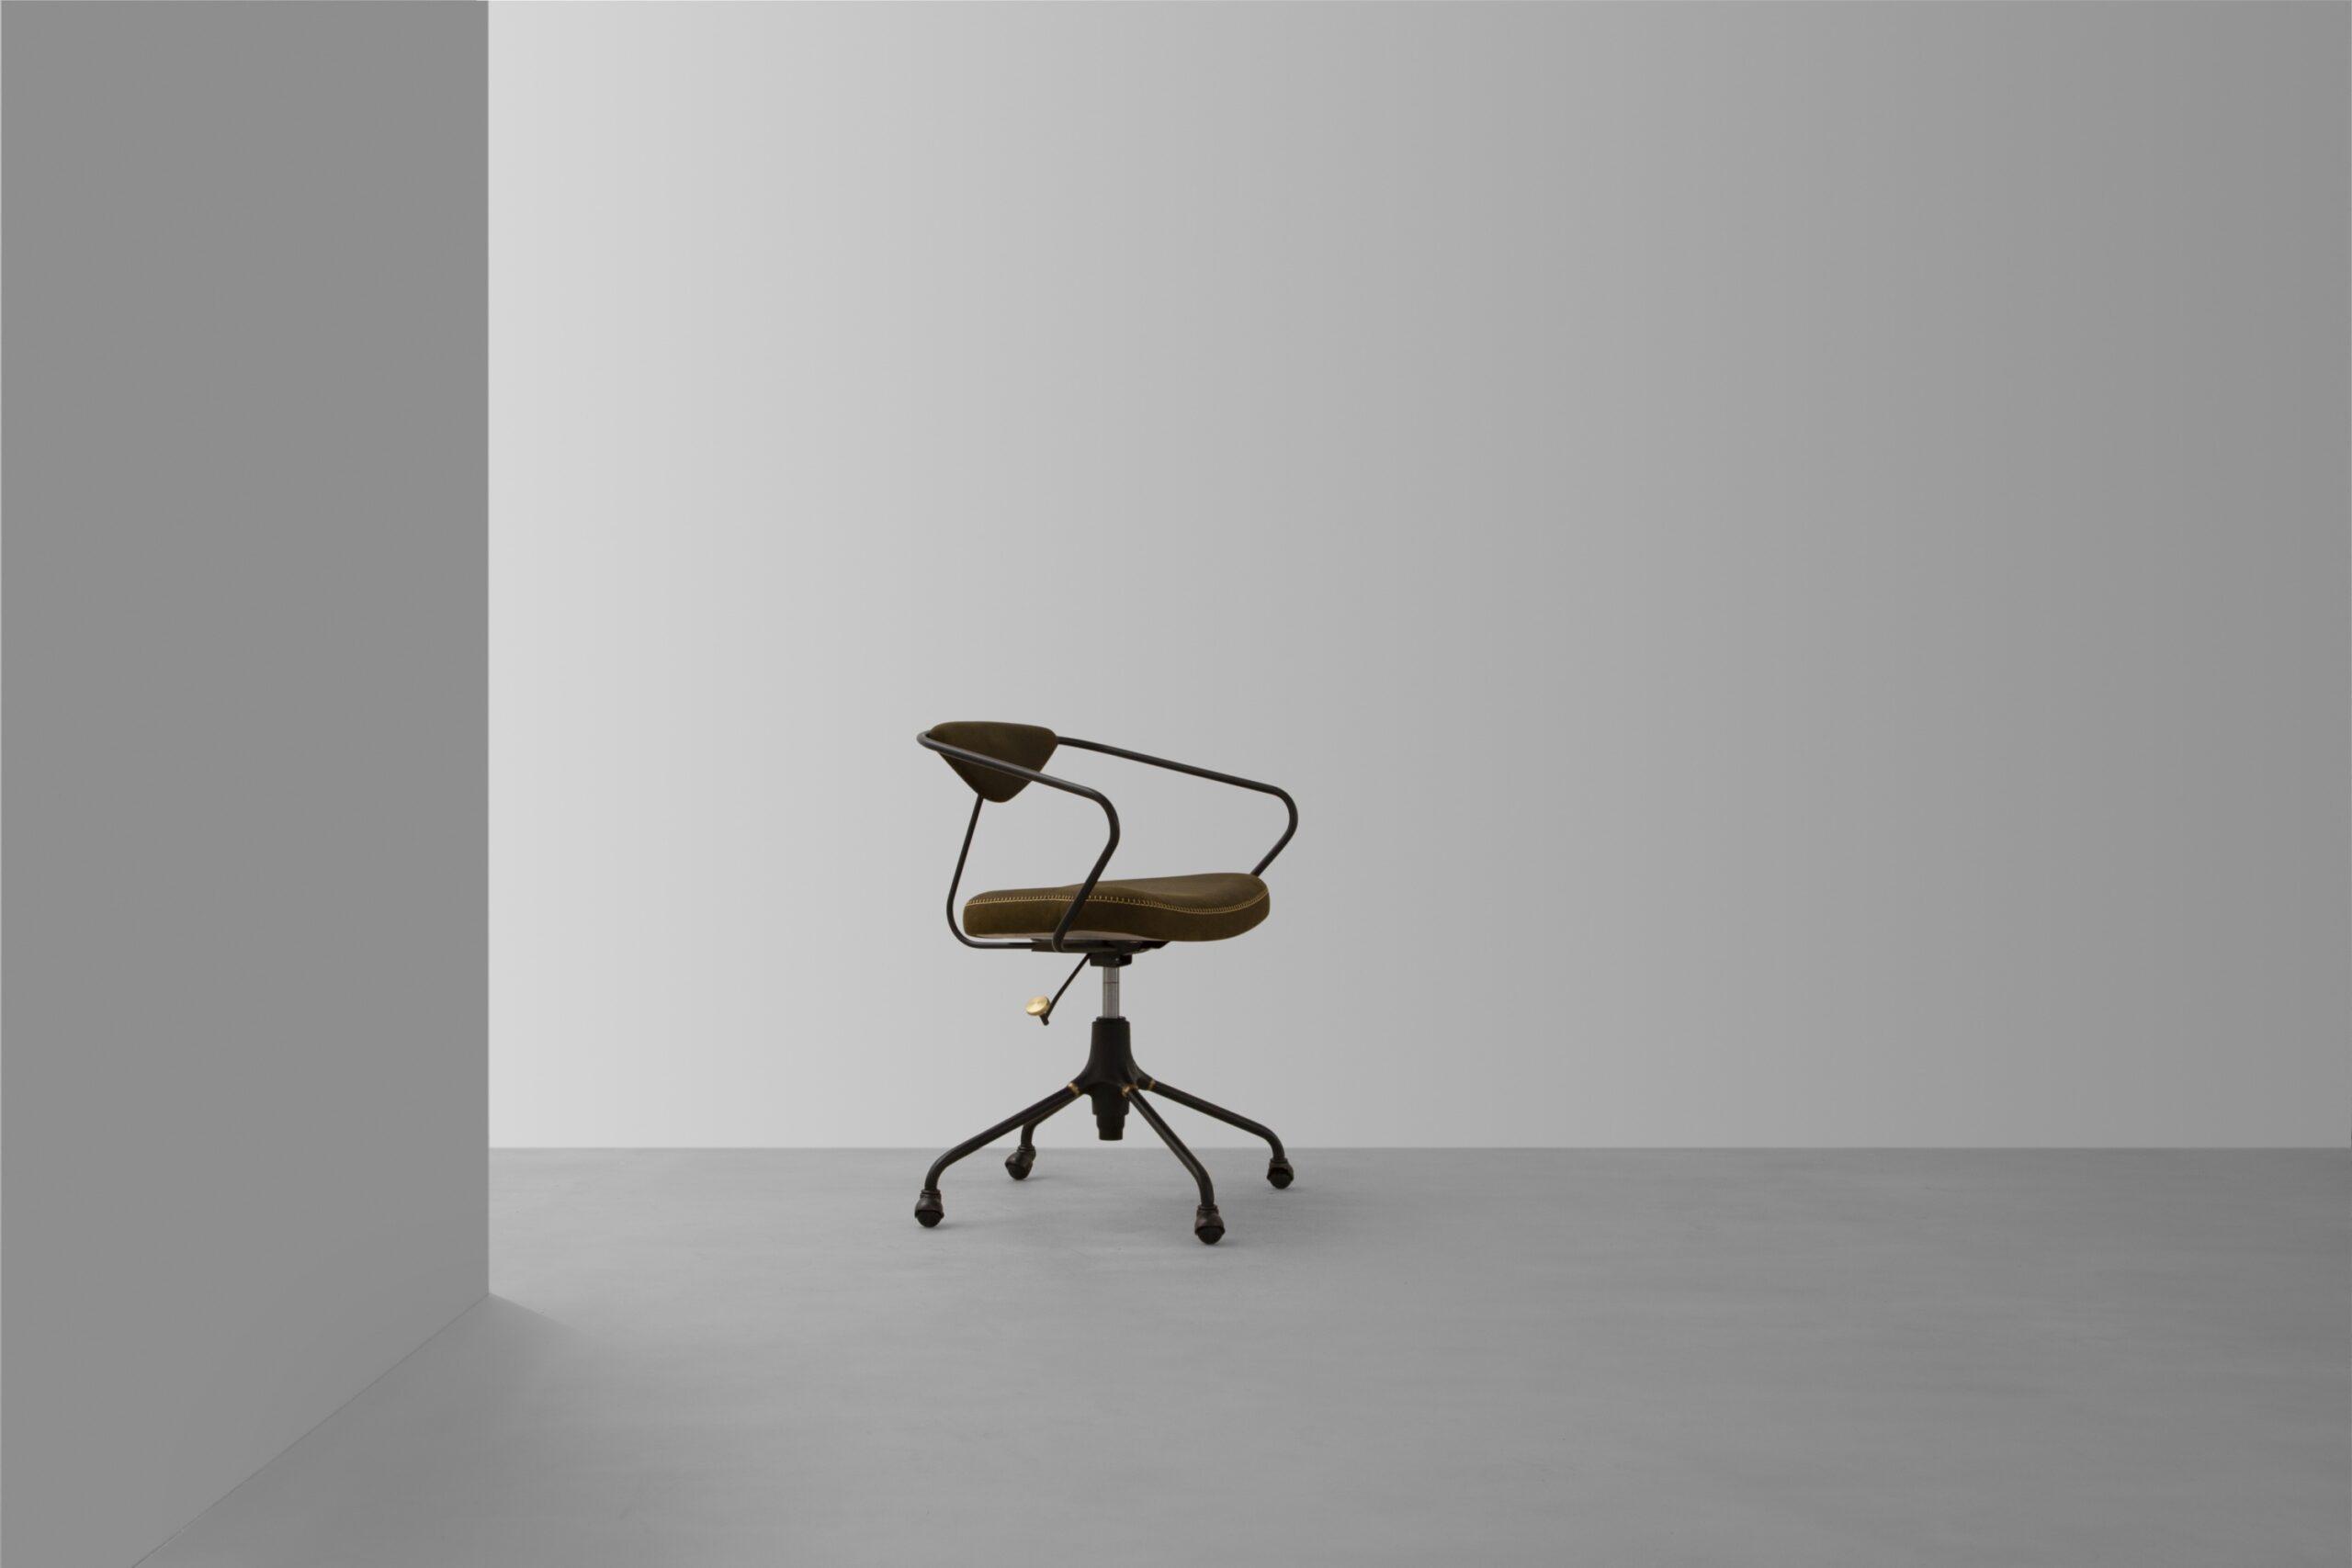 Dunke Design Akron deskchair soft jin 2